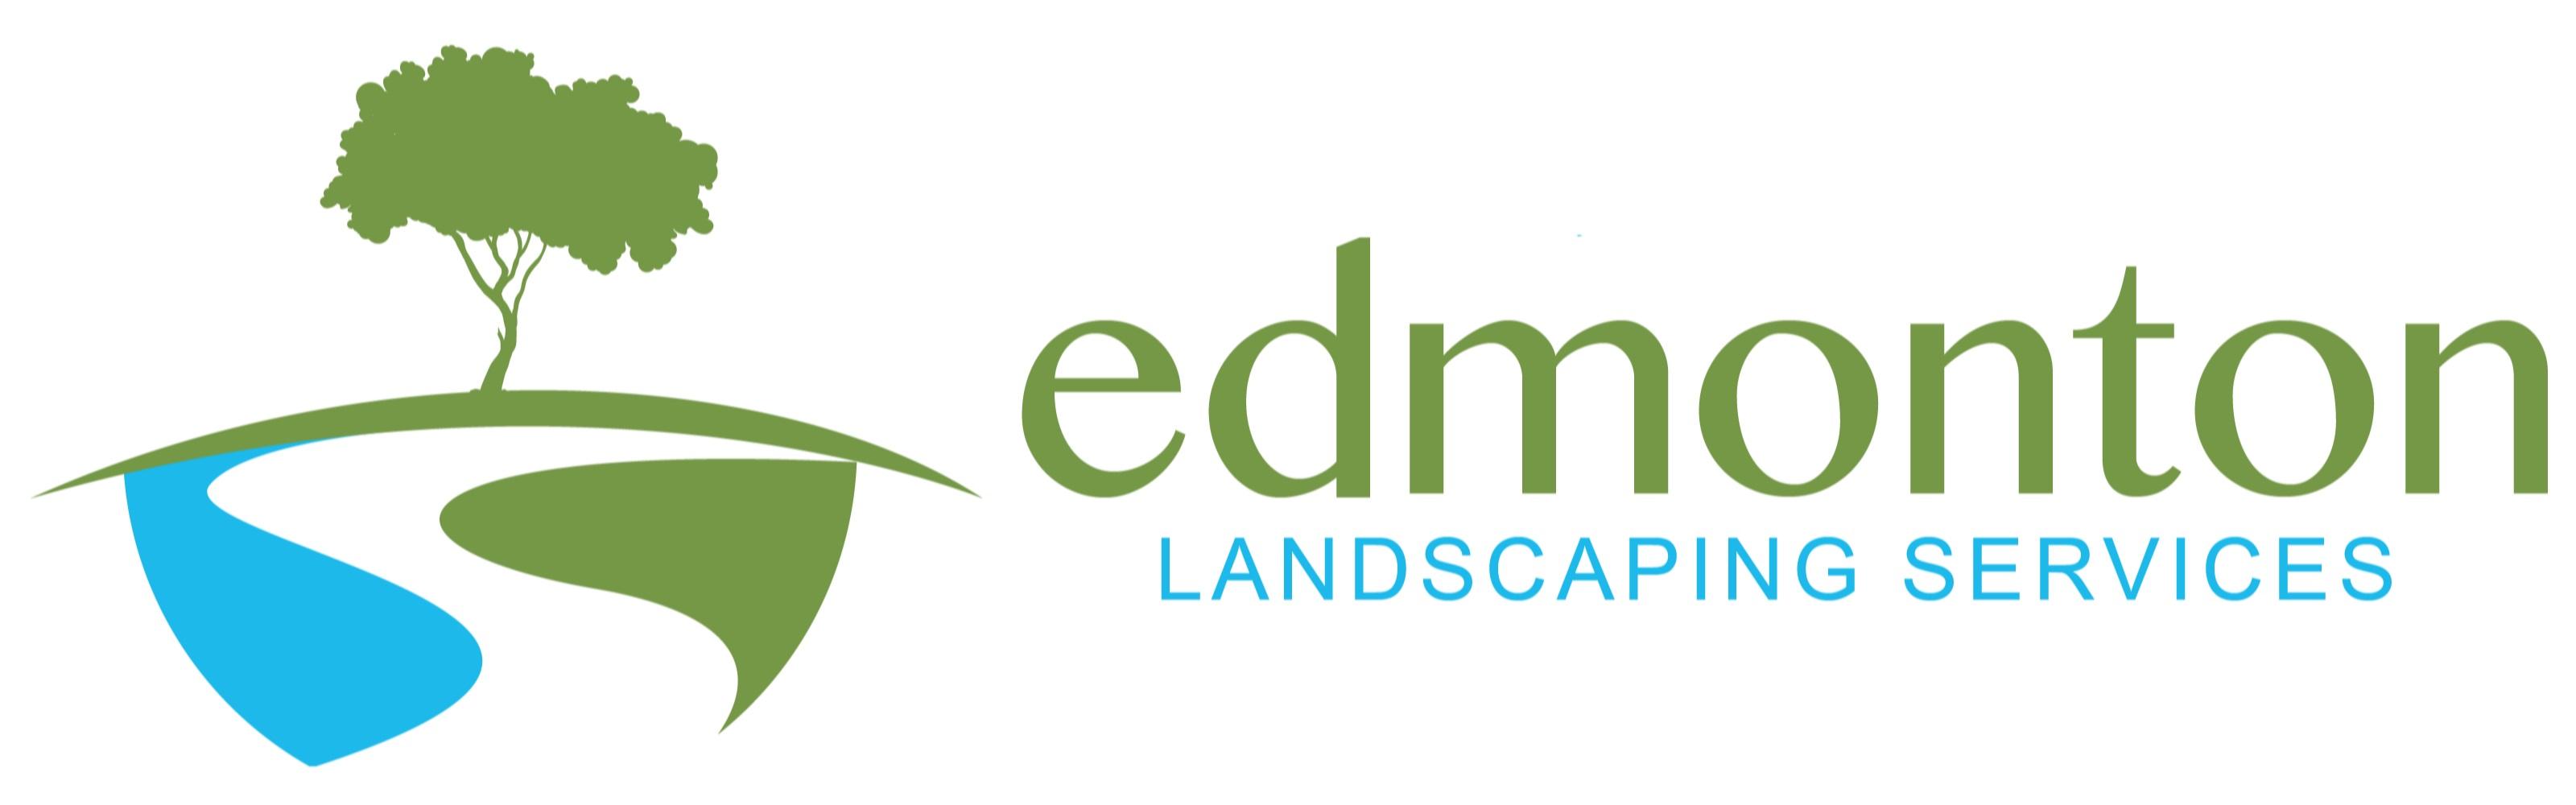 EdmontonLandscapingServicesLogo1.jpg